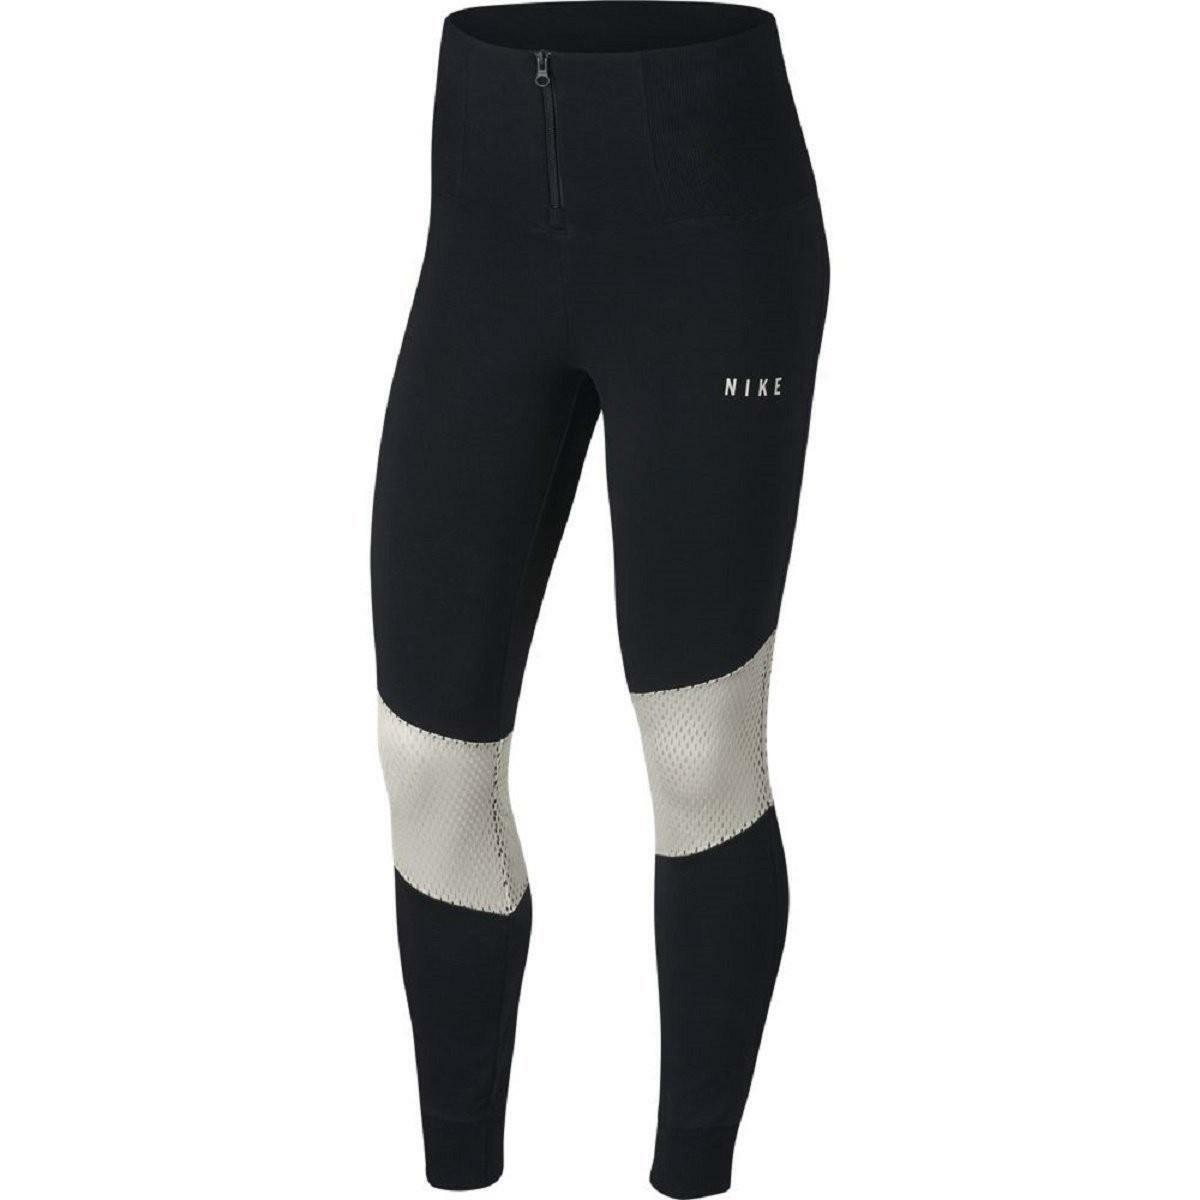 nike nike essential leggings mesh donna neri 893663011